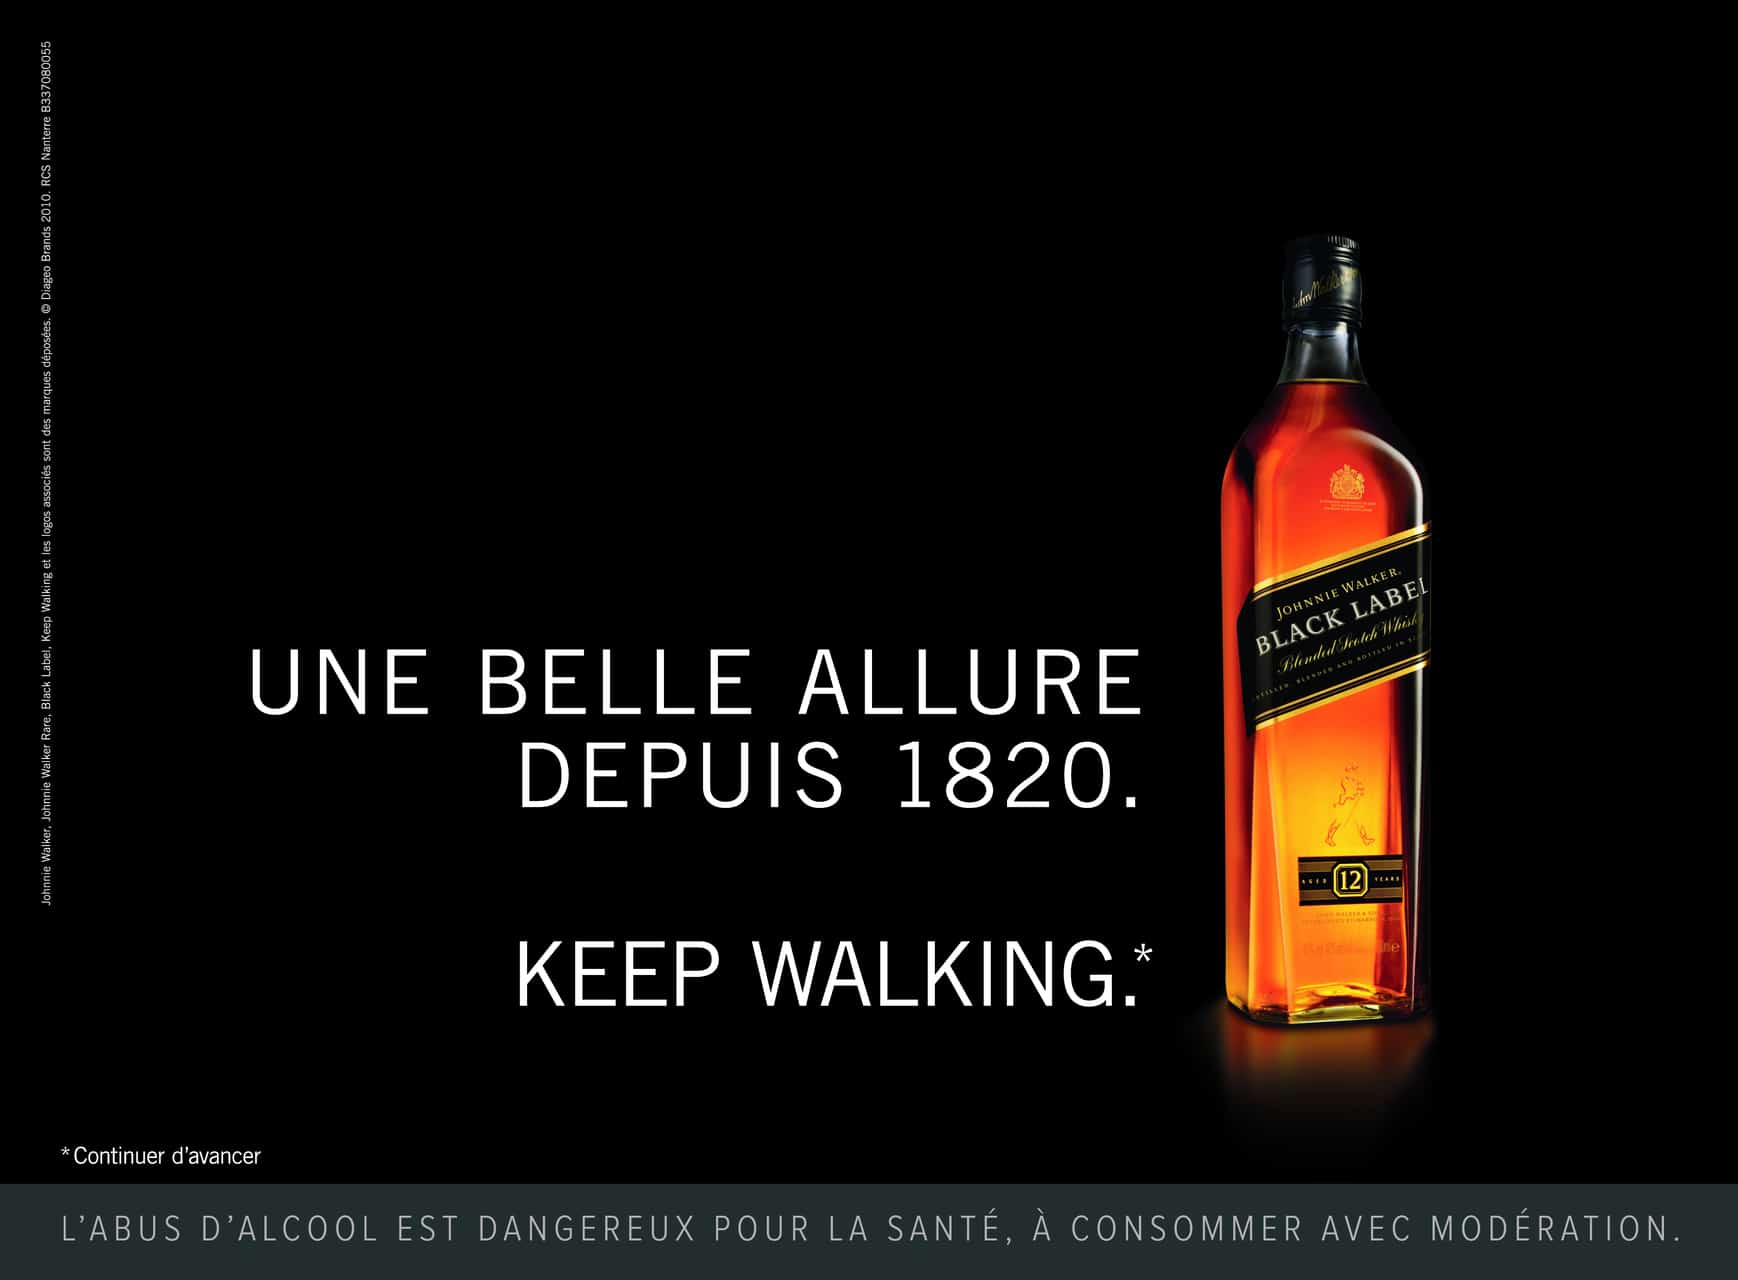 Pub Johnnie Walker Scotch